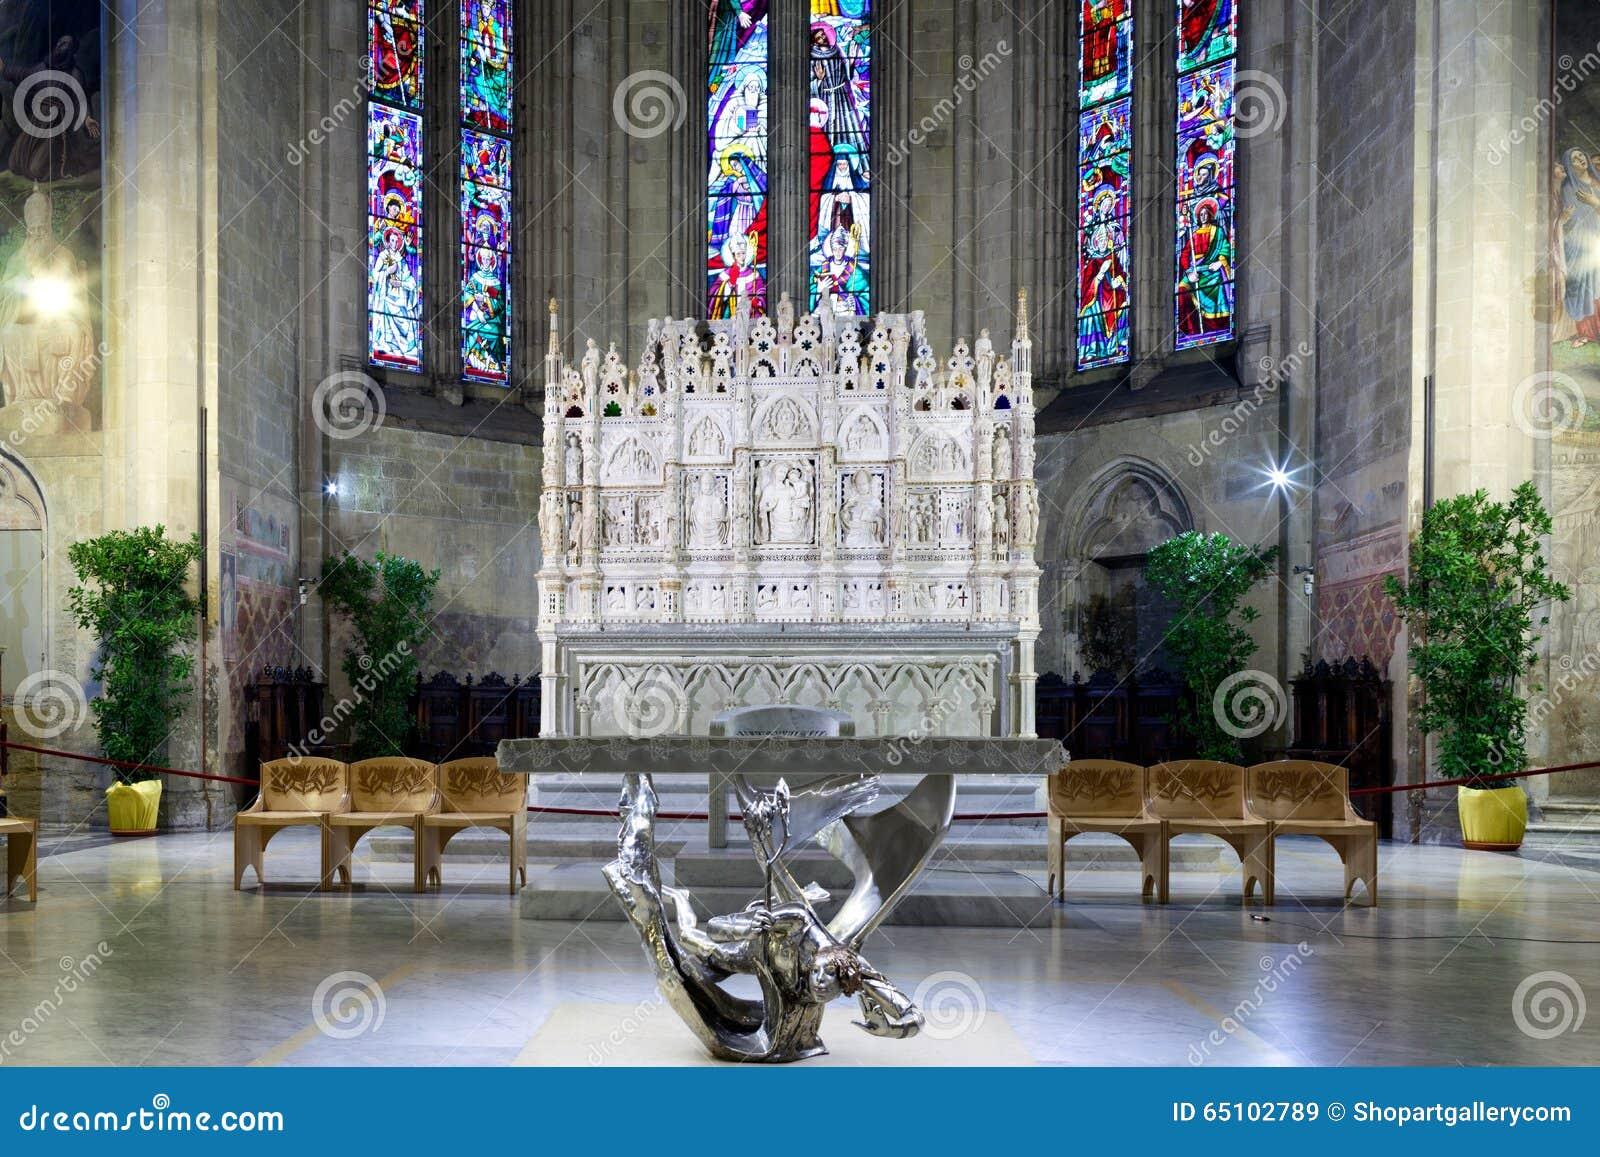 Presbytery of Arezzo Cathedral